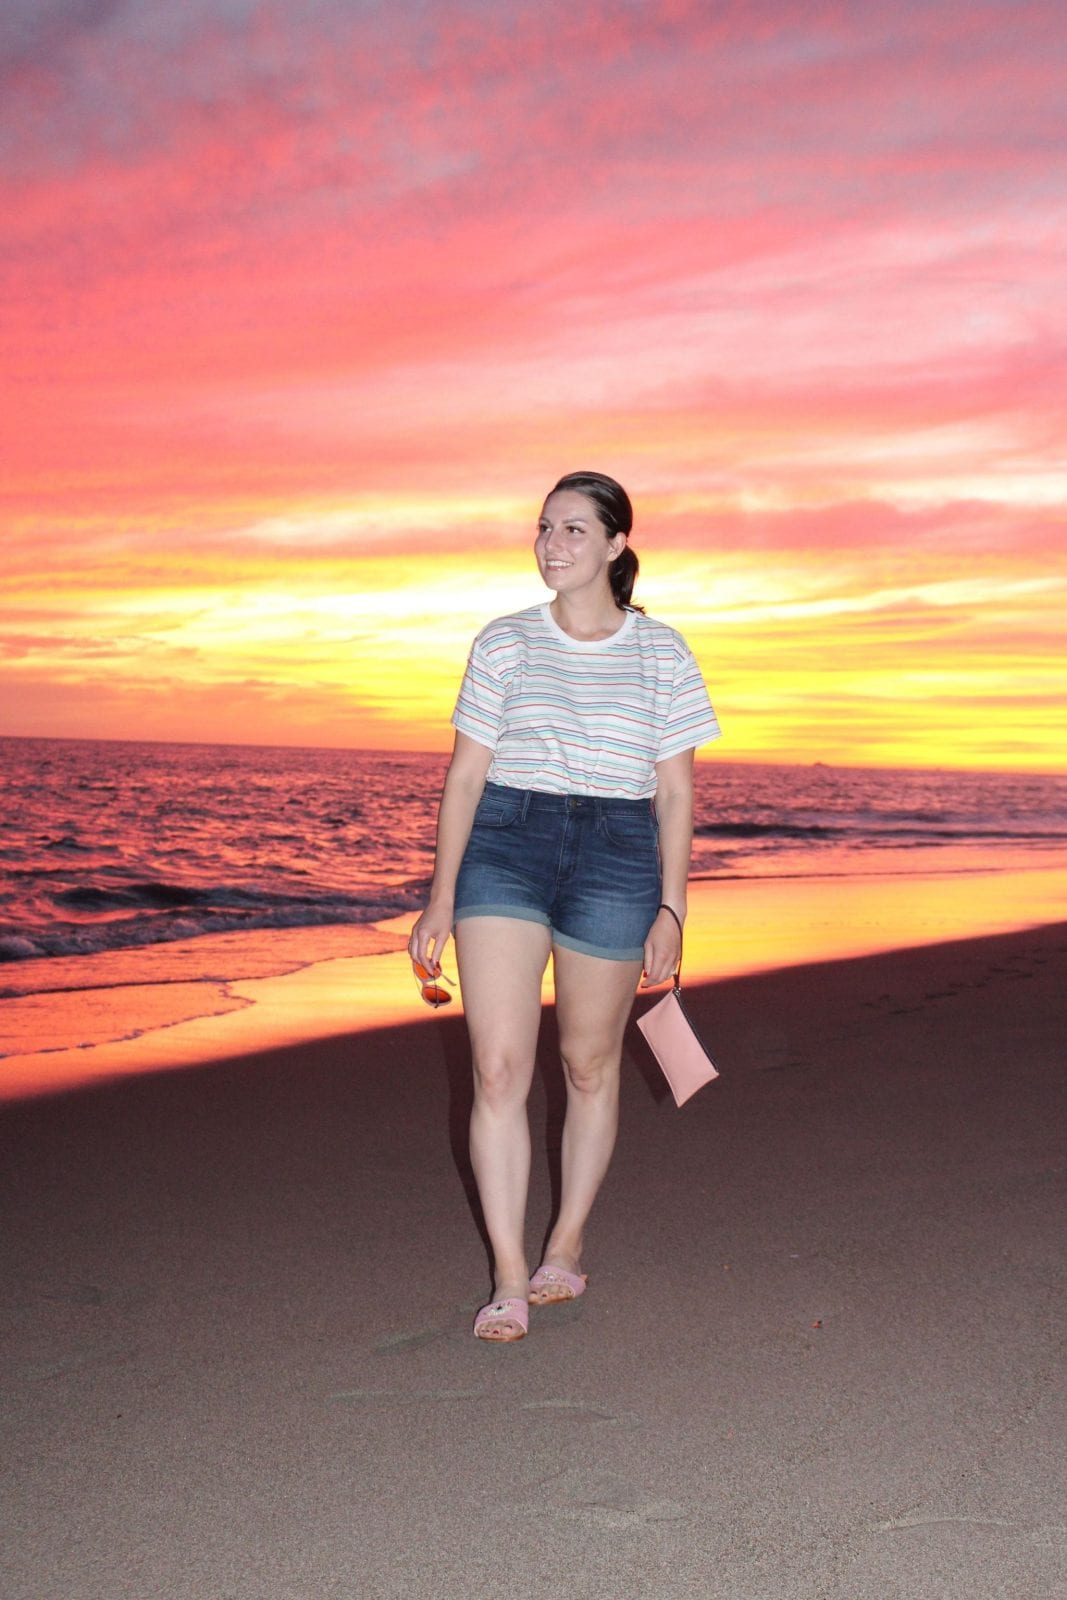 Walking Along the Beach in Puerto Vallarta